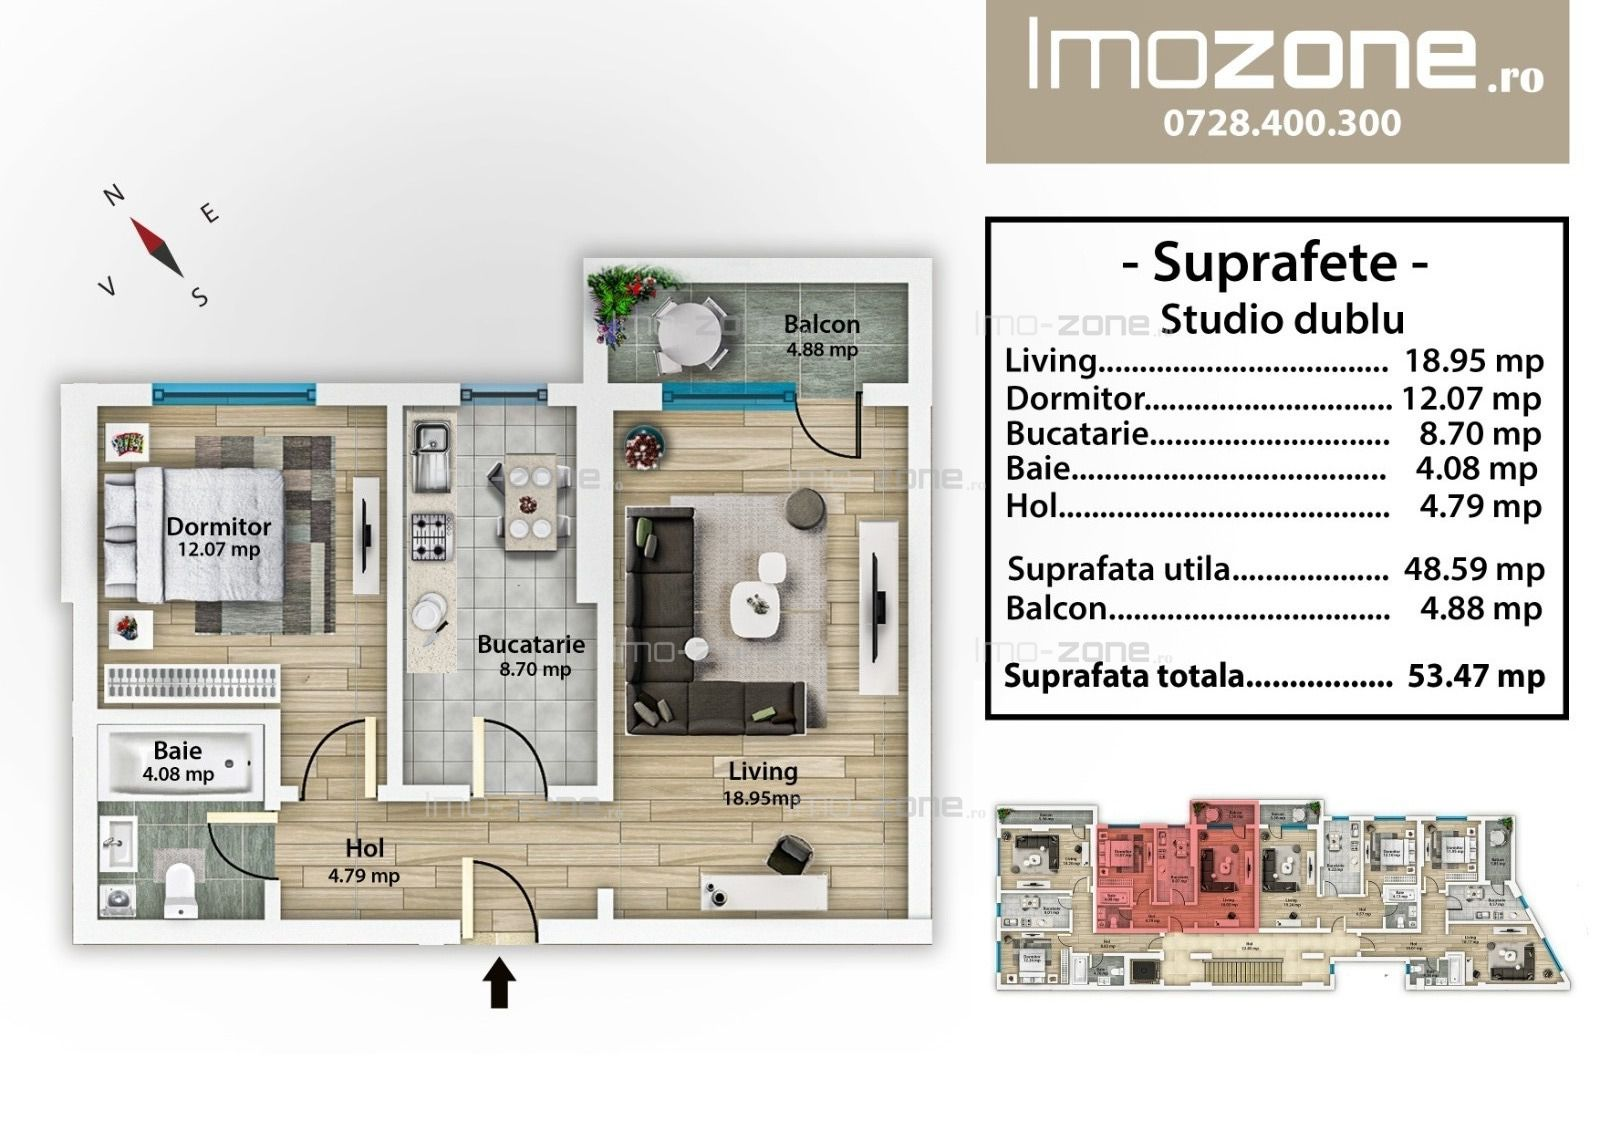 Bloc nou- Mall Plaza, 2 camere, decomandat, etaj 1, bucatarie inchisa, balcon